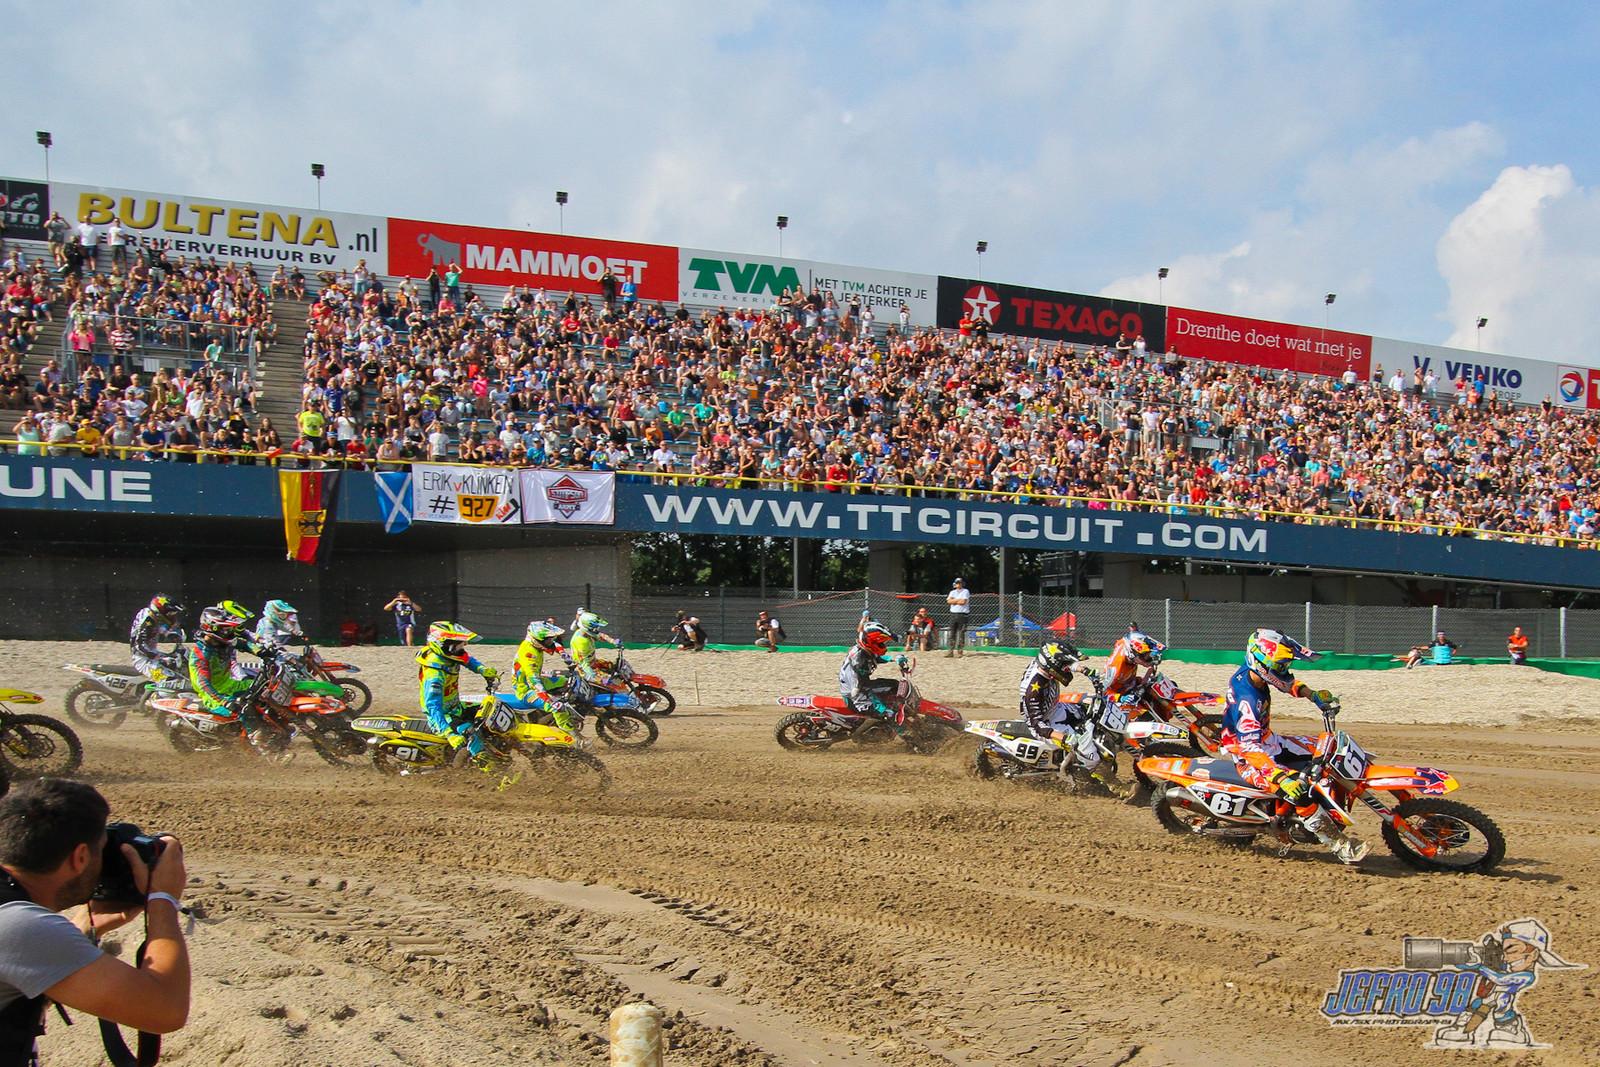 MX2 Moto 2 Start - Photo Gallery: MXGP of the Netherlands - Motocross Pictures - Vital MX